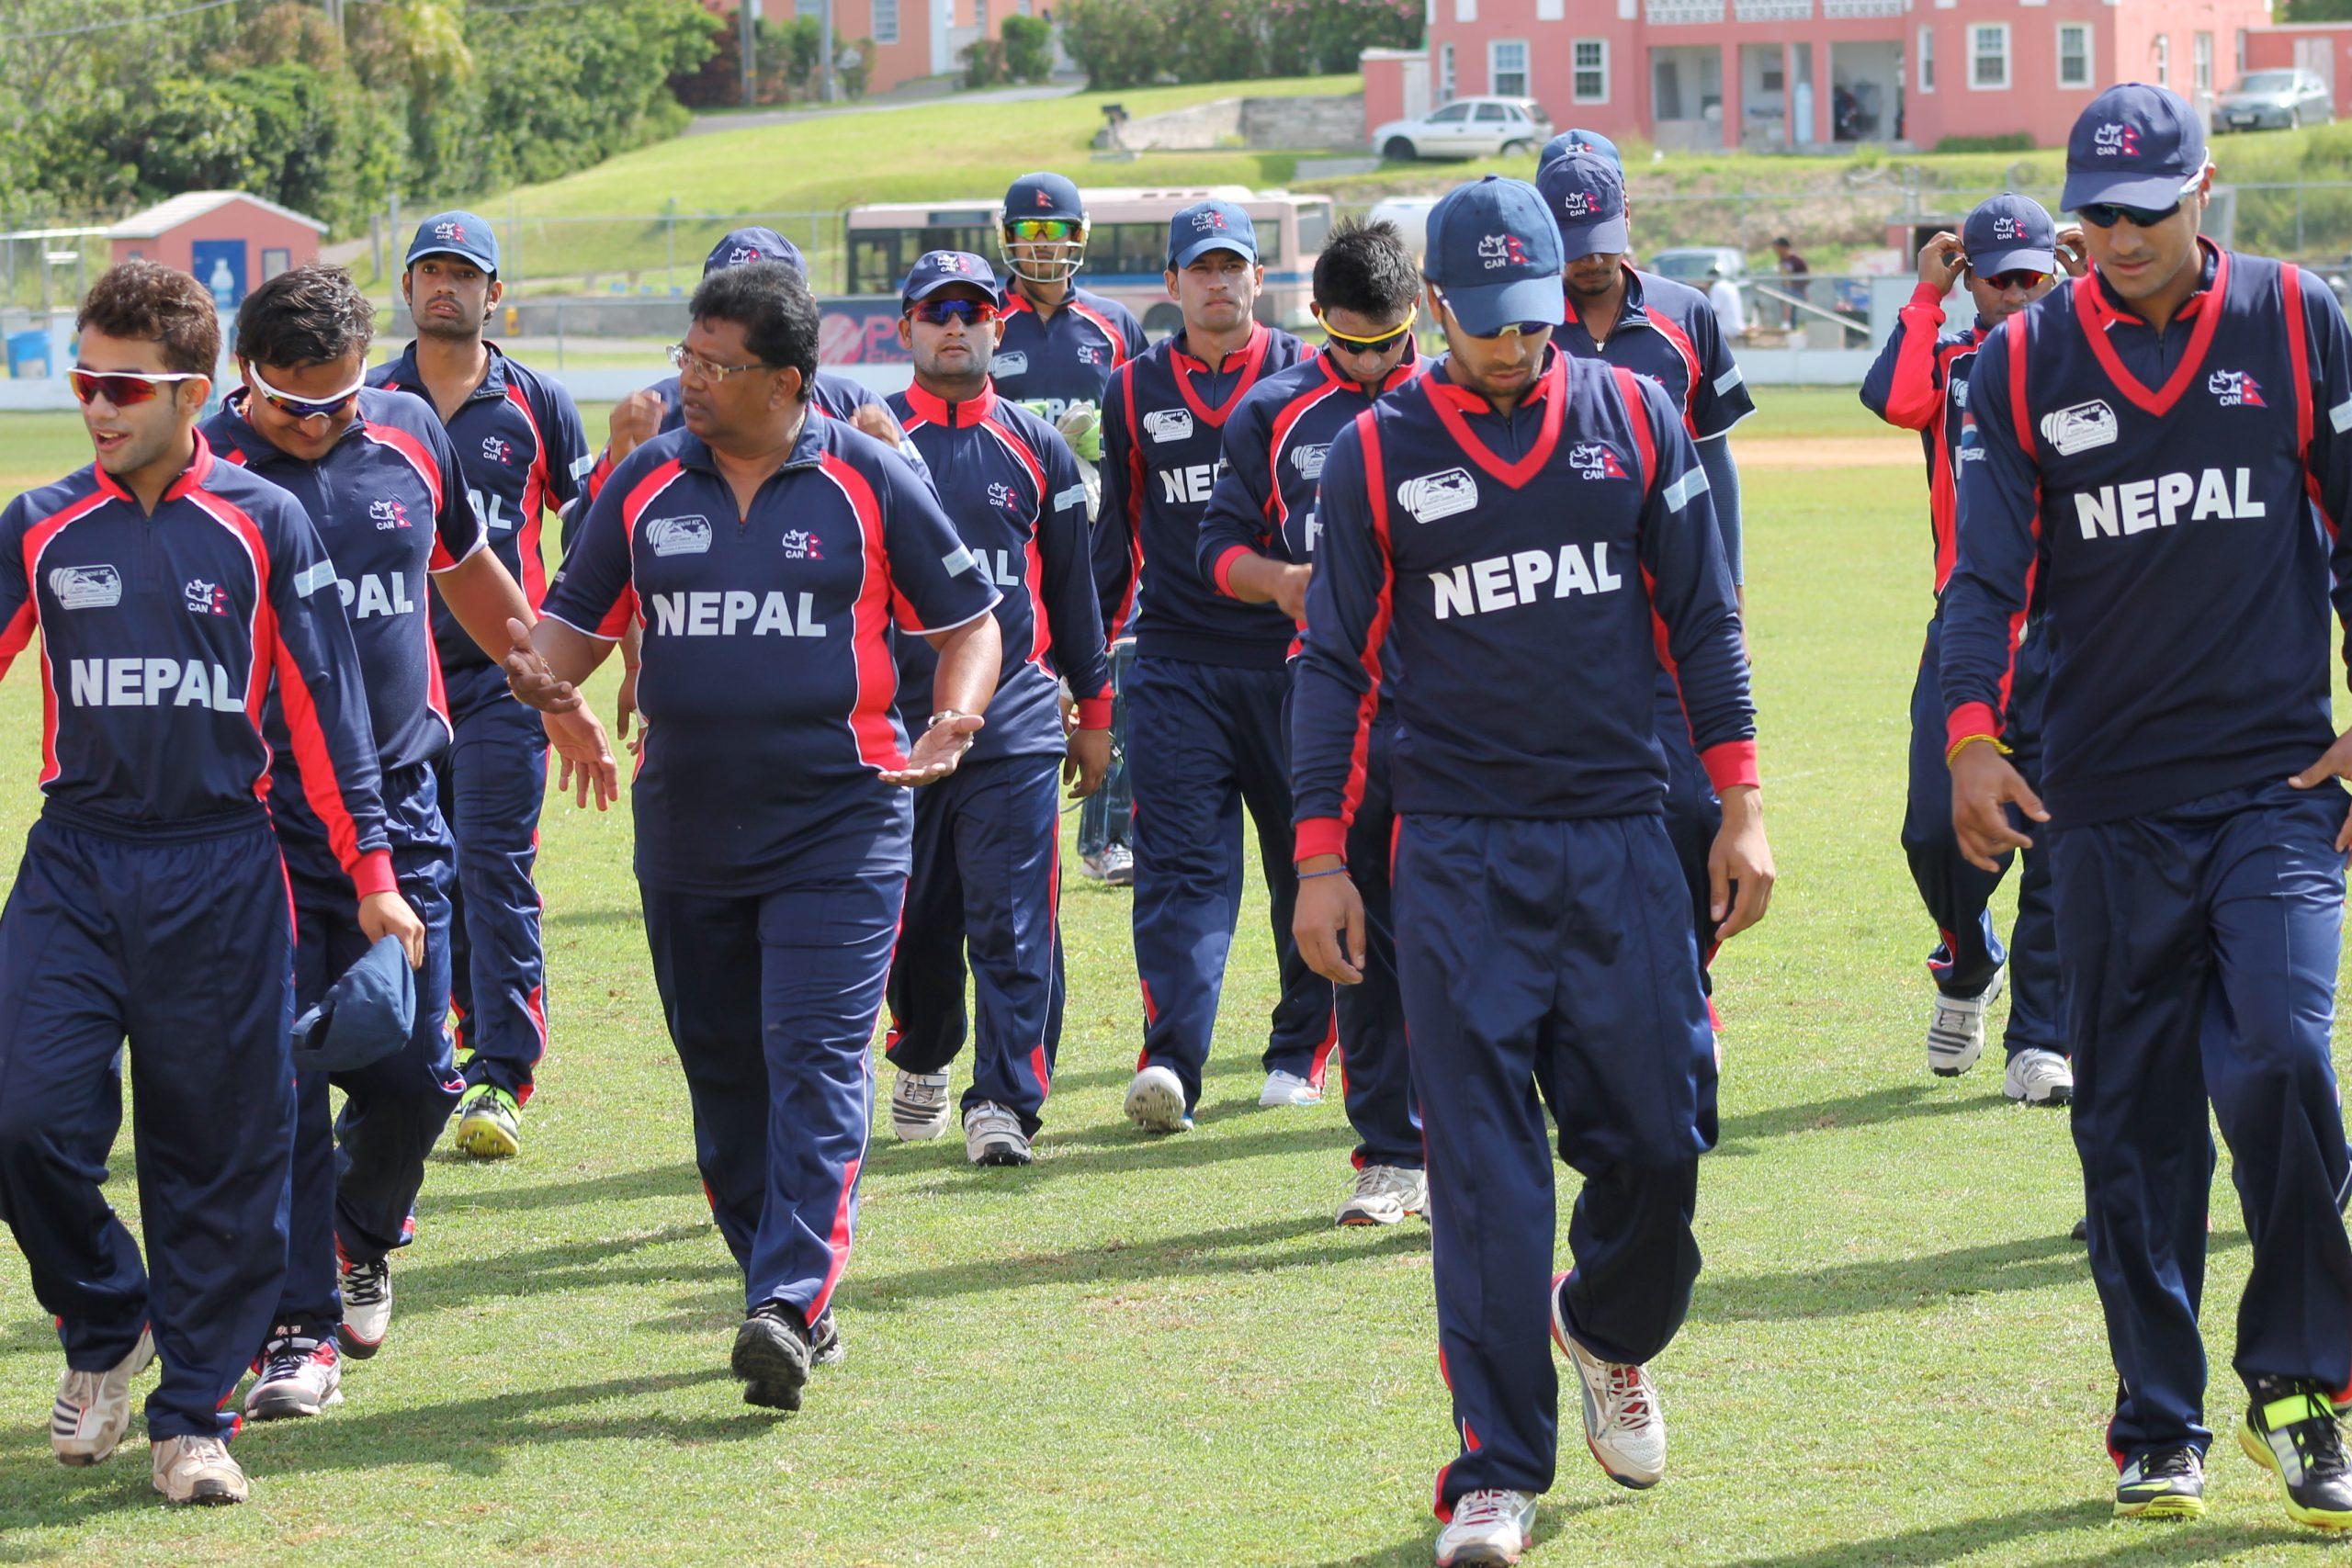 Nepali_National_Cricket_team